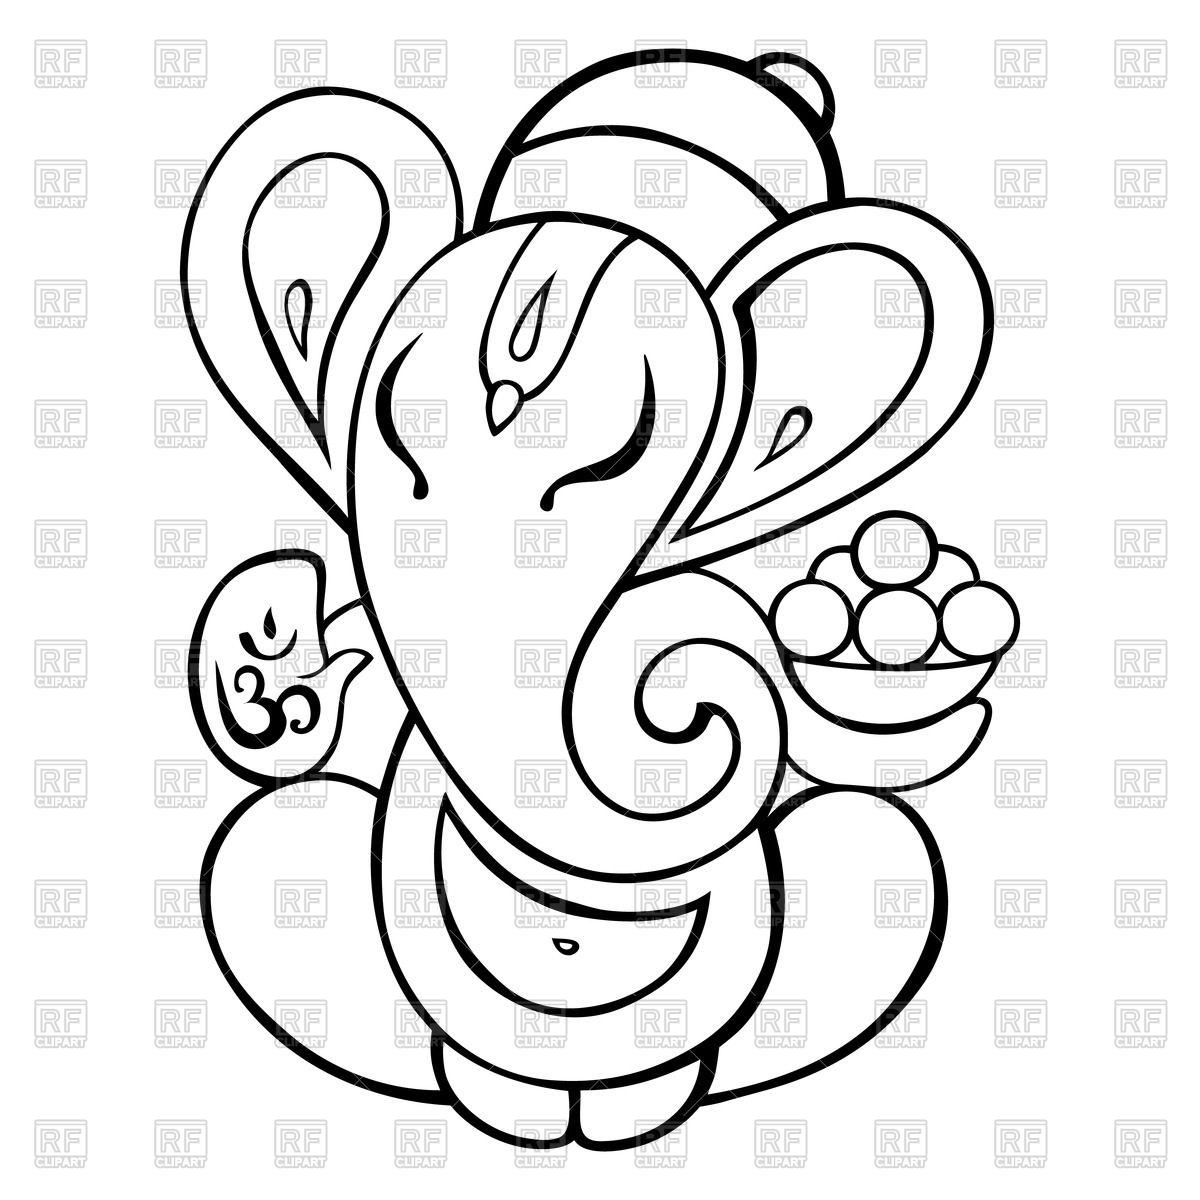 Line Art Vinayagar : Ganesh drawing outline at getdrawings free for